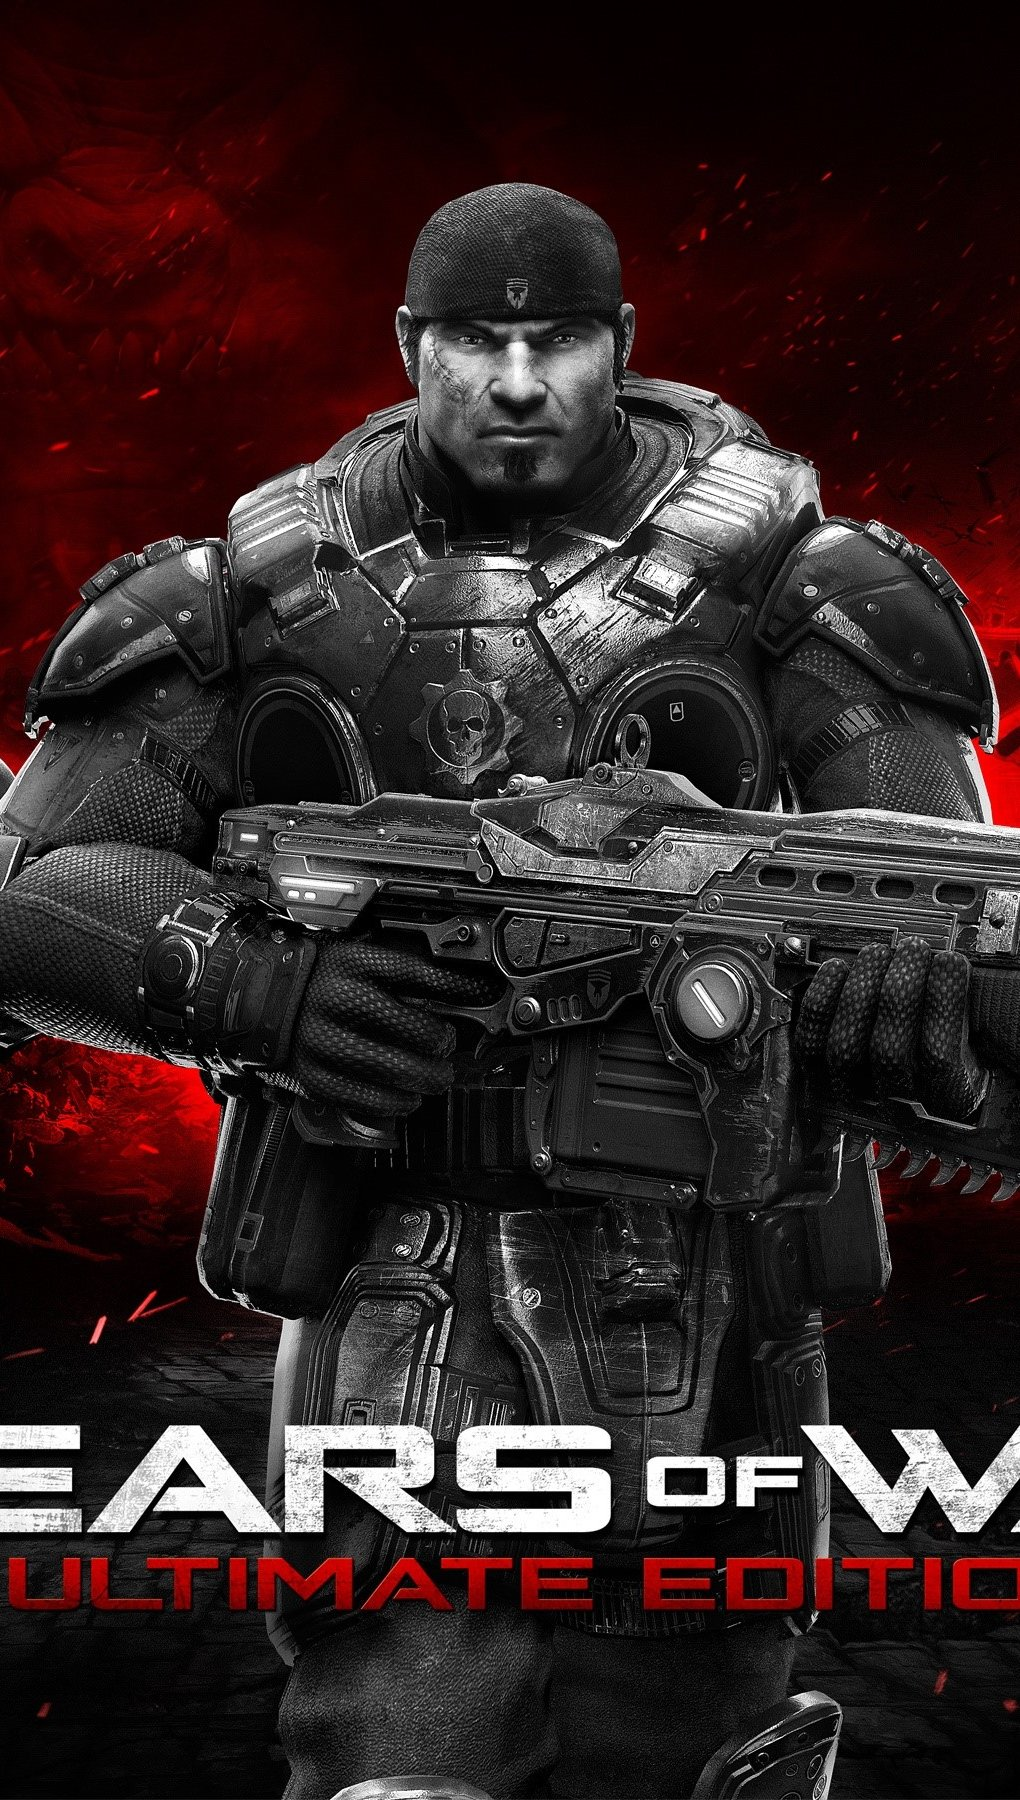 Fondos de pantalla Gears Of War Ultimate Edition Vertical